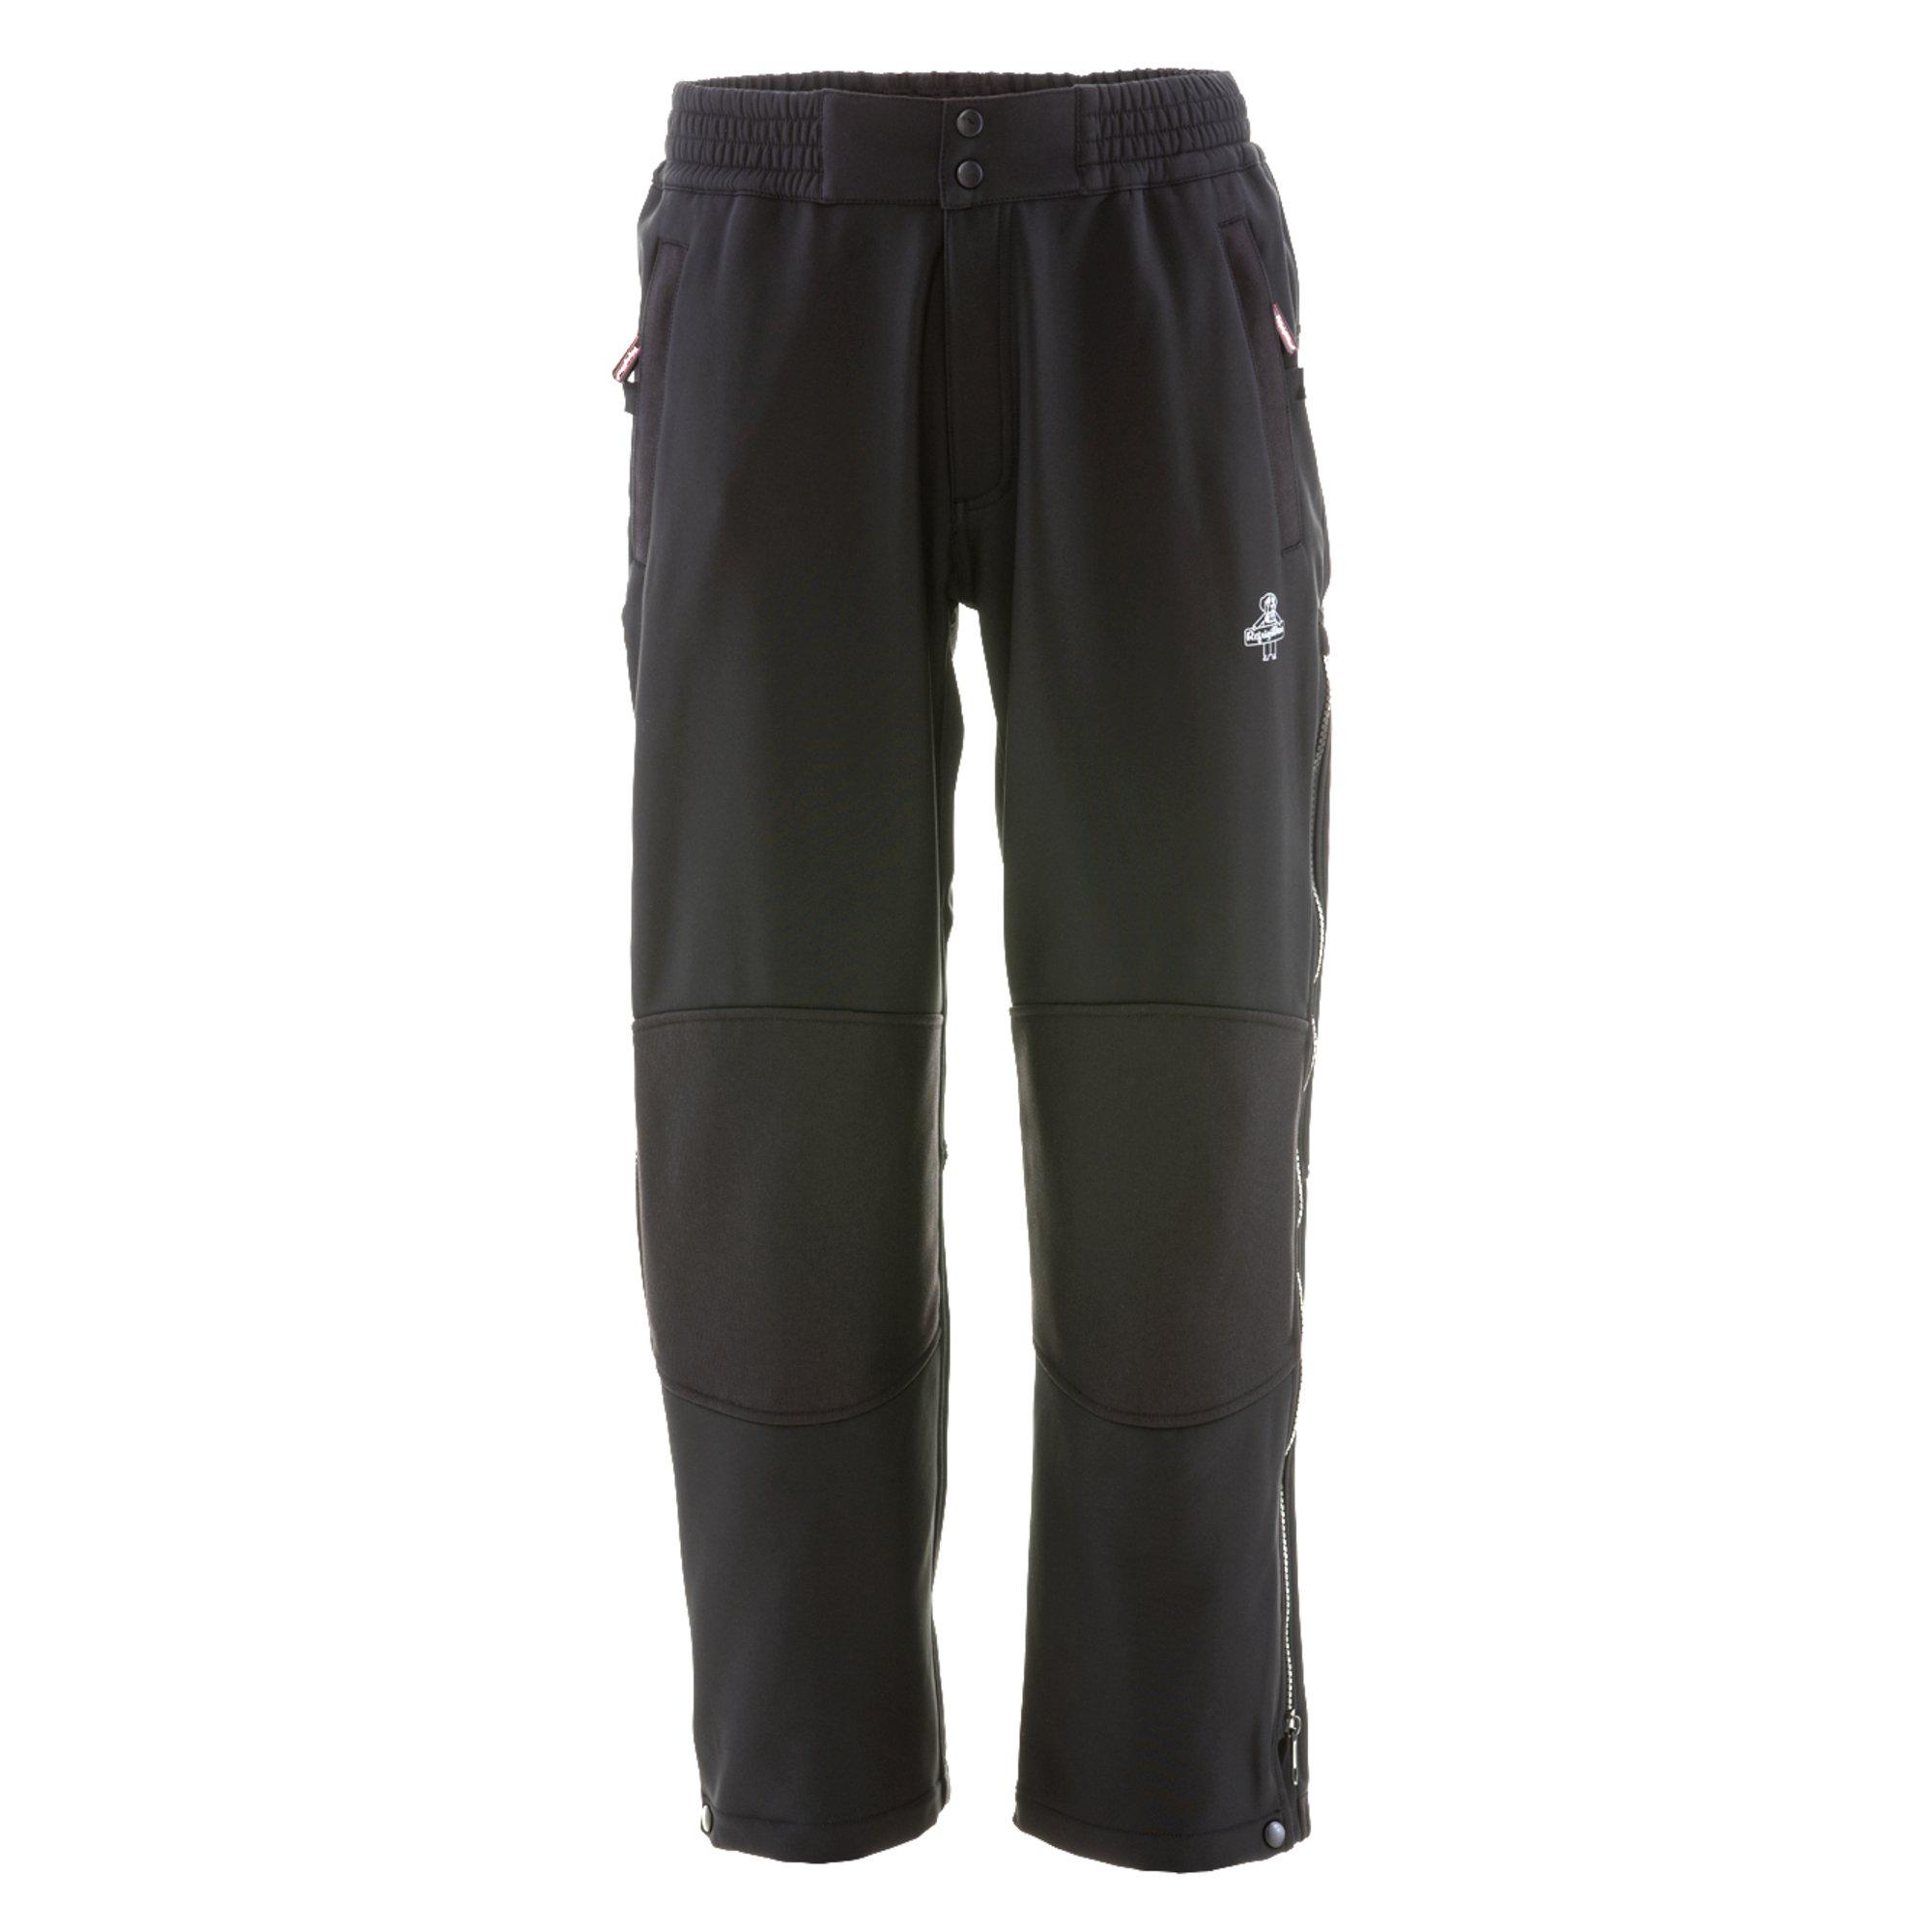 Refrigiwear Men's Water-Resistant Warm Softshell Pants (Black, Medium)